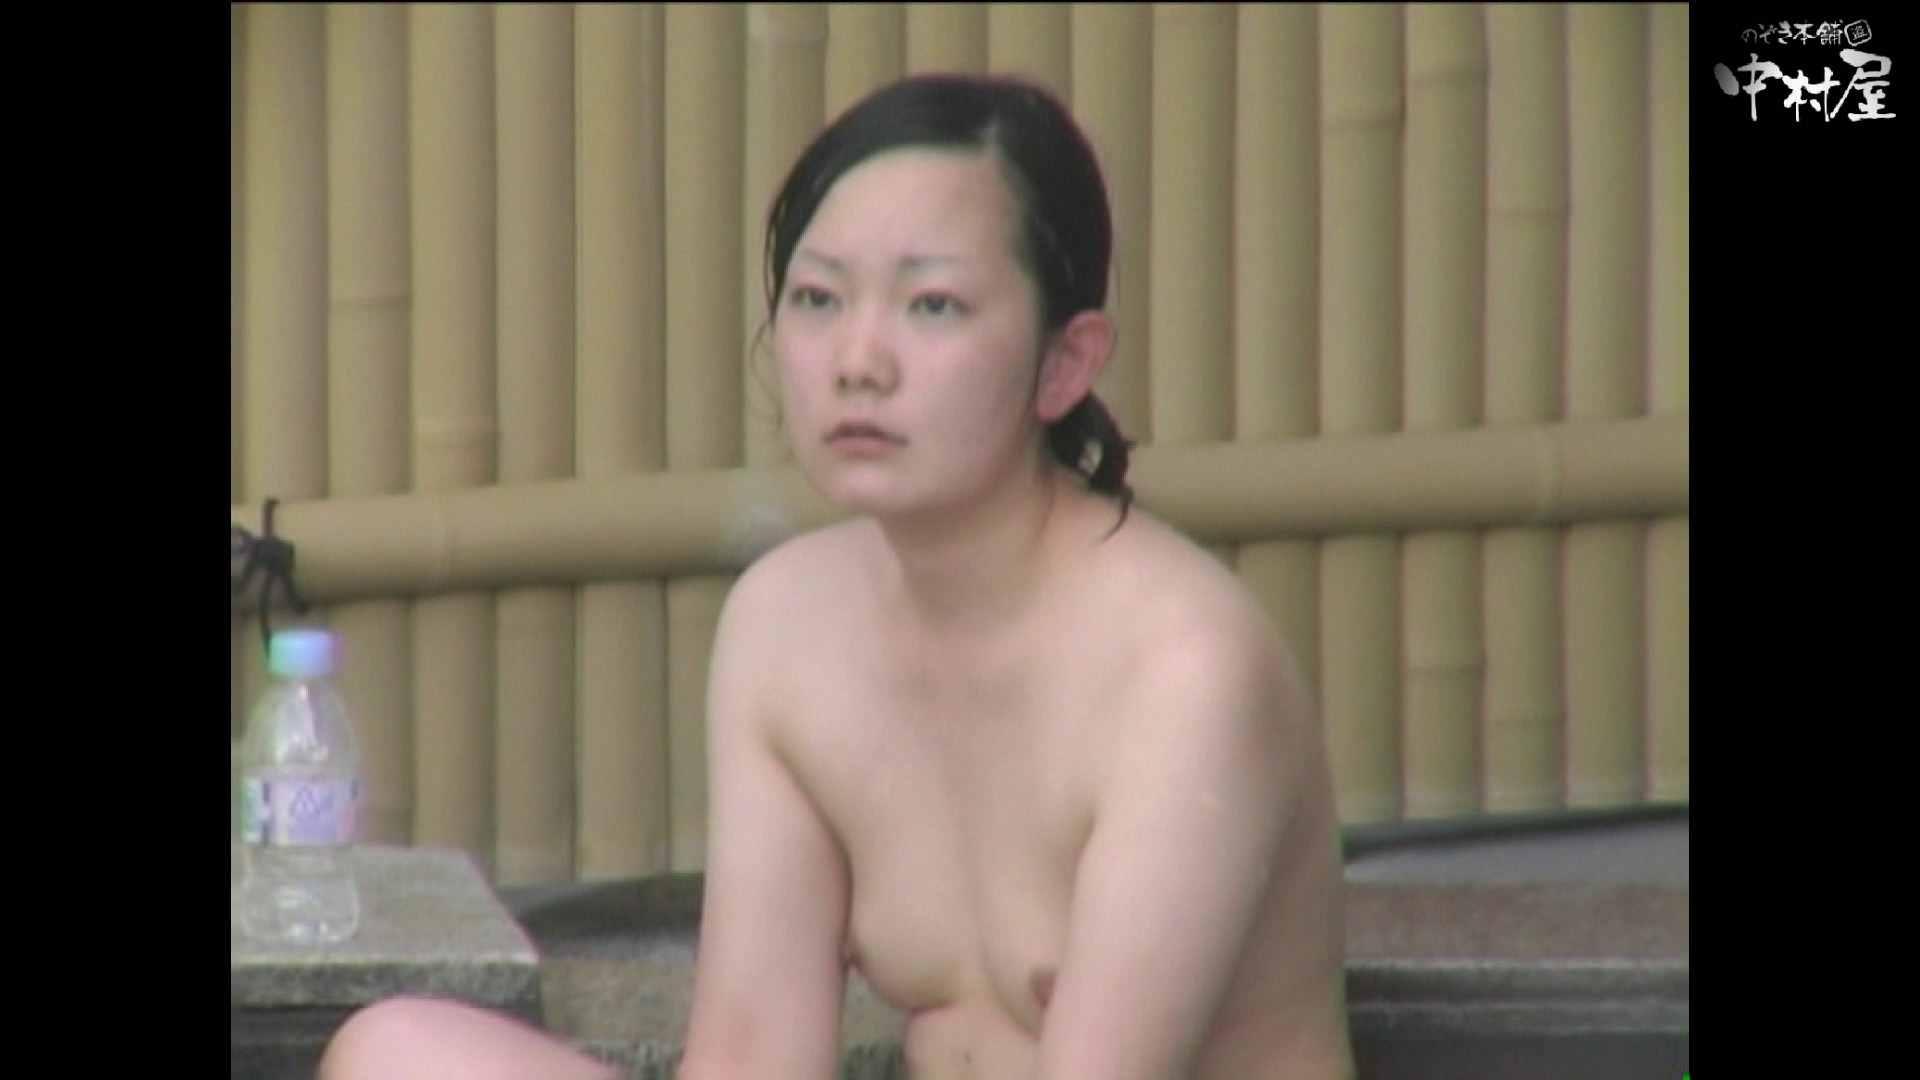 Aquaな露天風呂Vol.892 露天風呂   OLのエロ生活  39連発 34